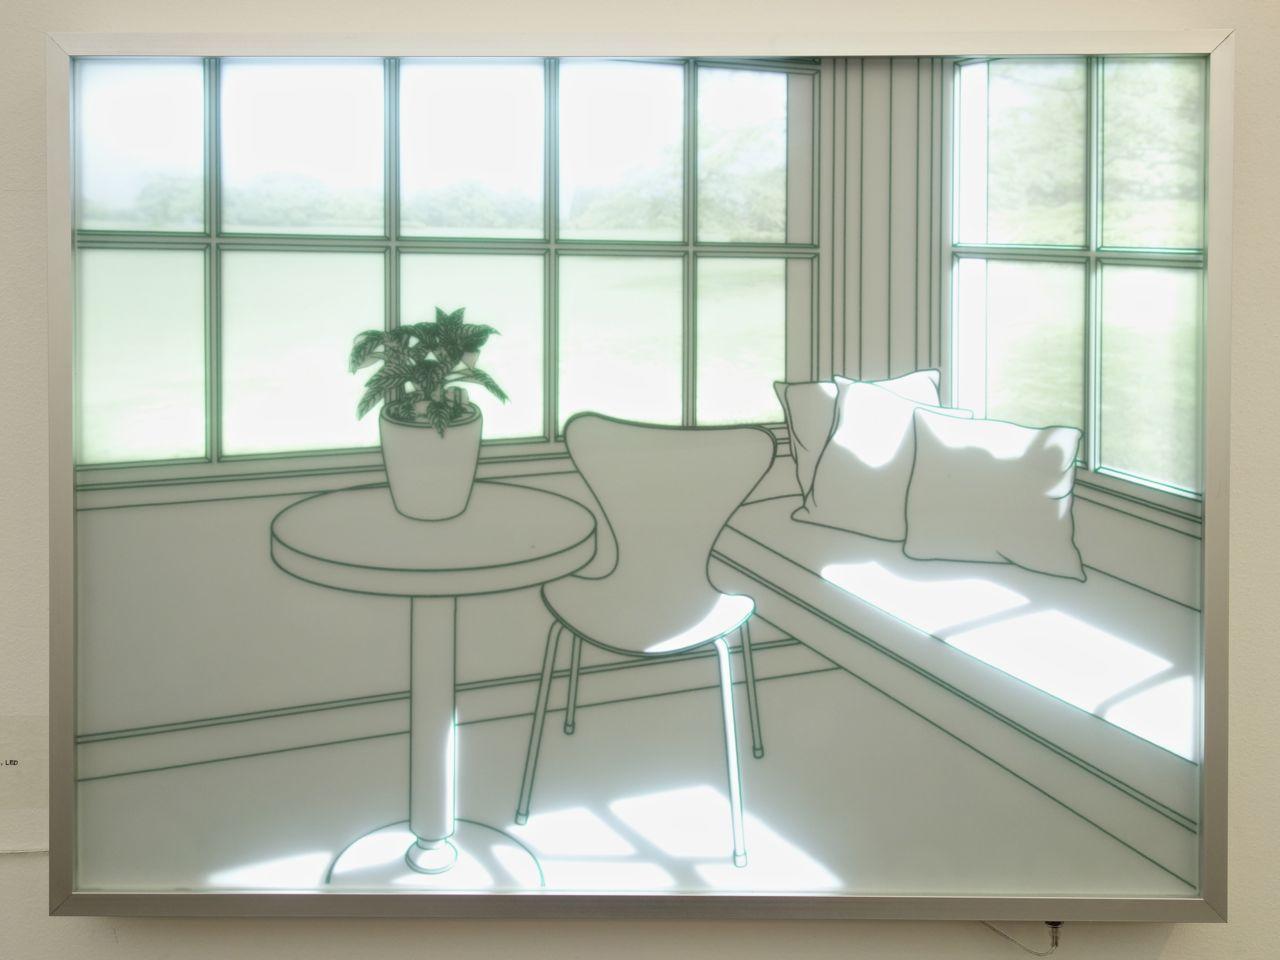 Sun Tae Hwang, 'The Sunny Room', Tempered glass, sandblast and LED, 31 x 67 x 4.5 cm. Gallery Tableau (Seoul, South Korea)